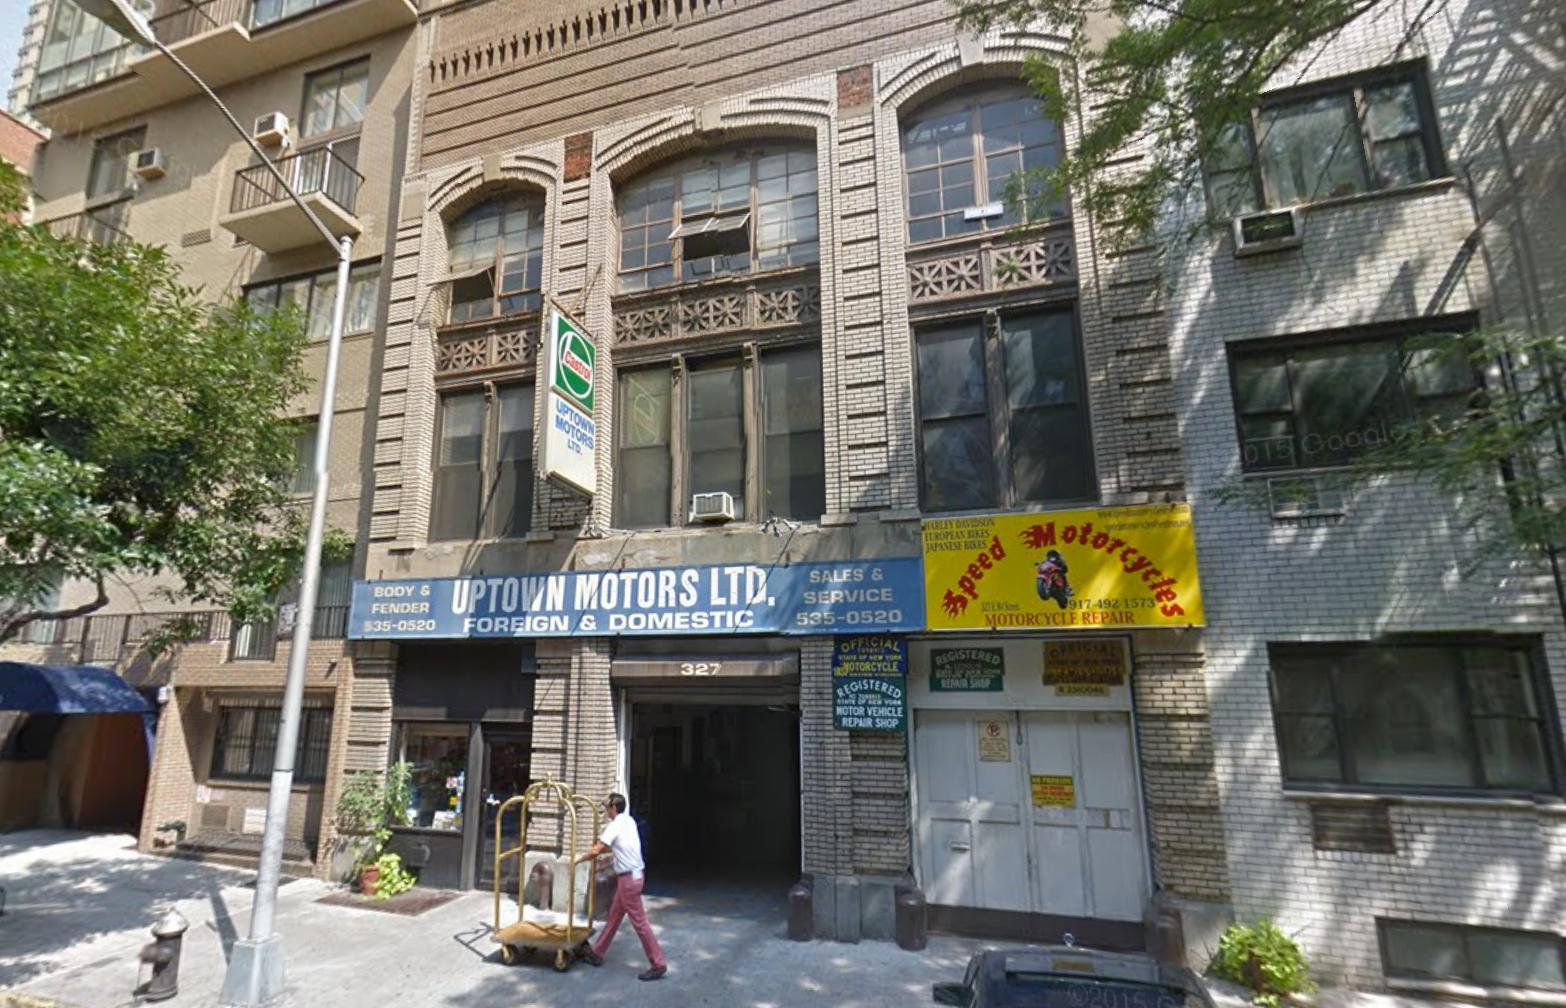 327 East 84th Street